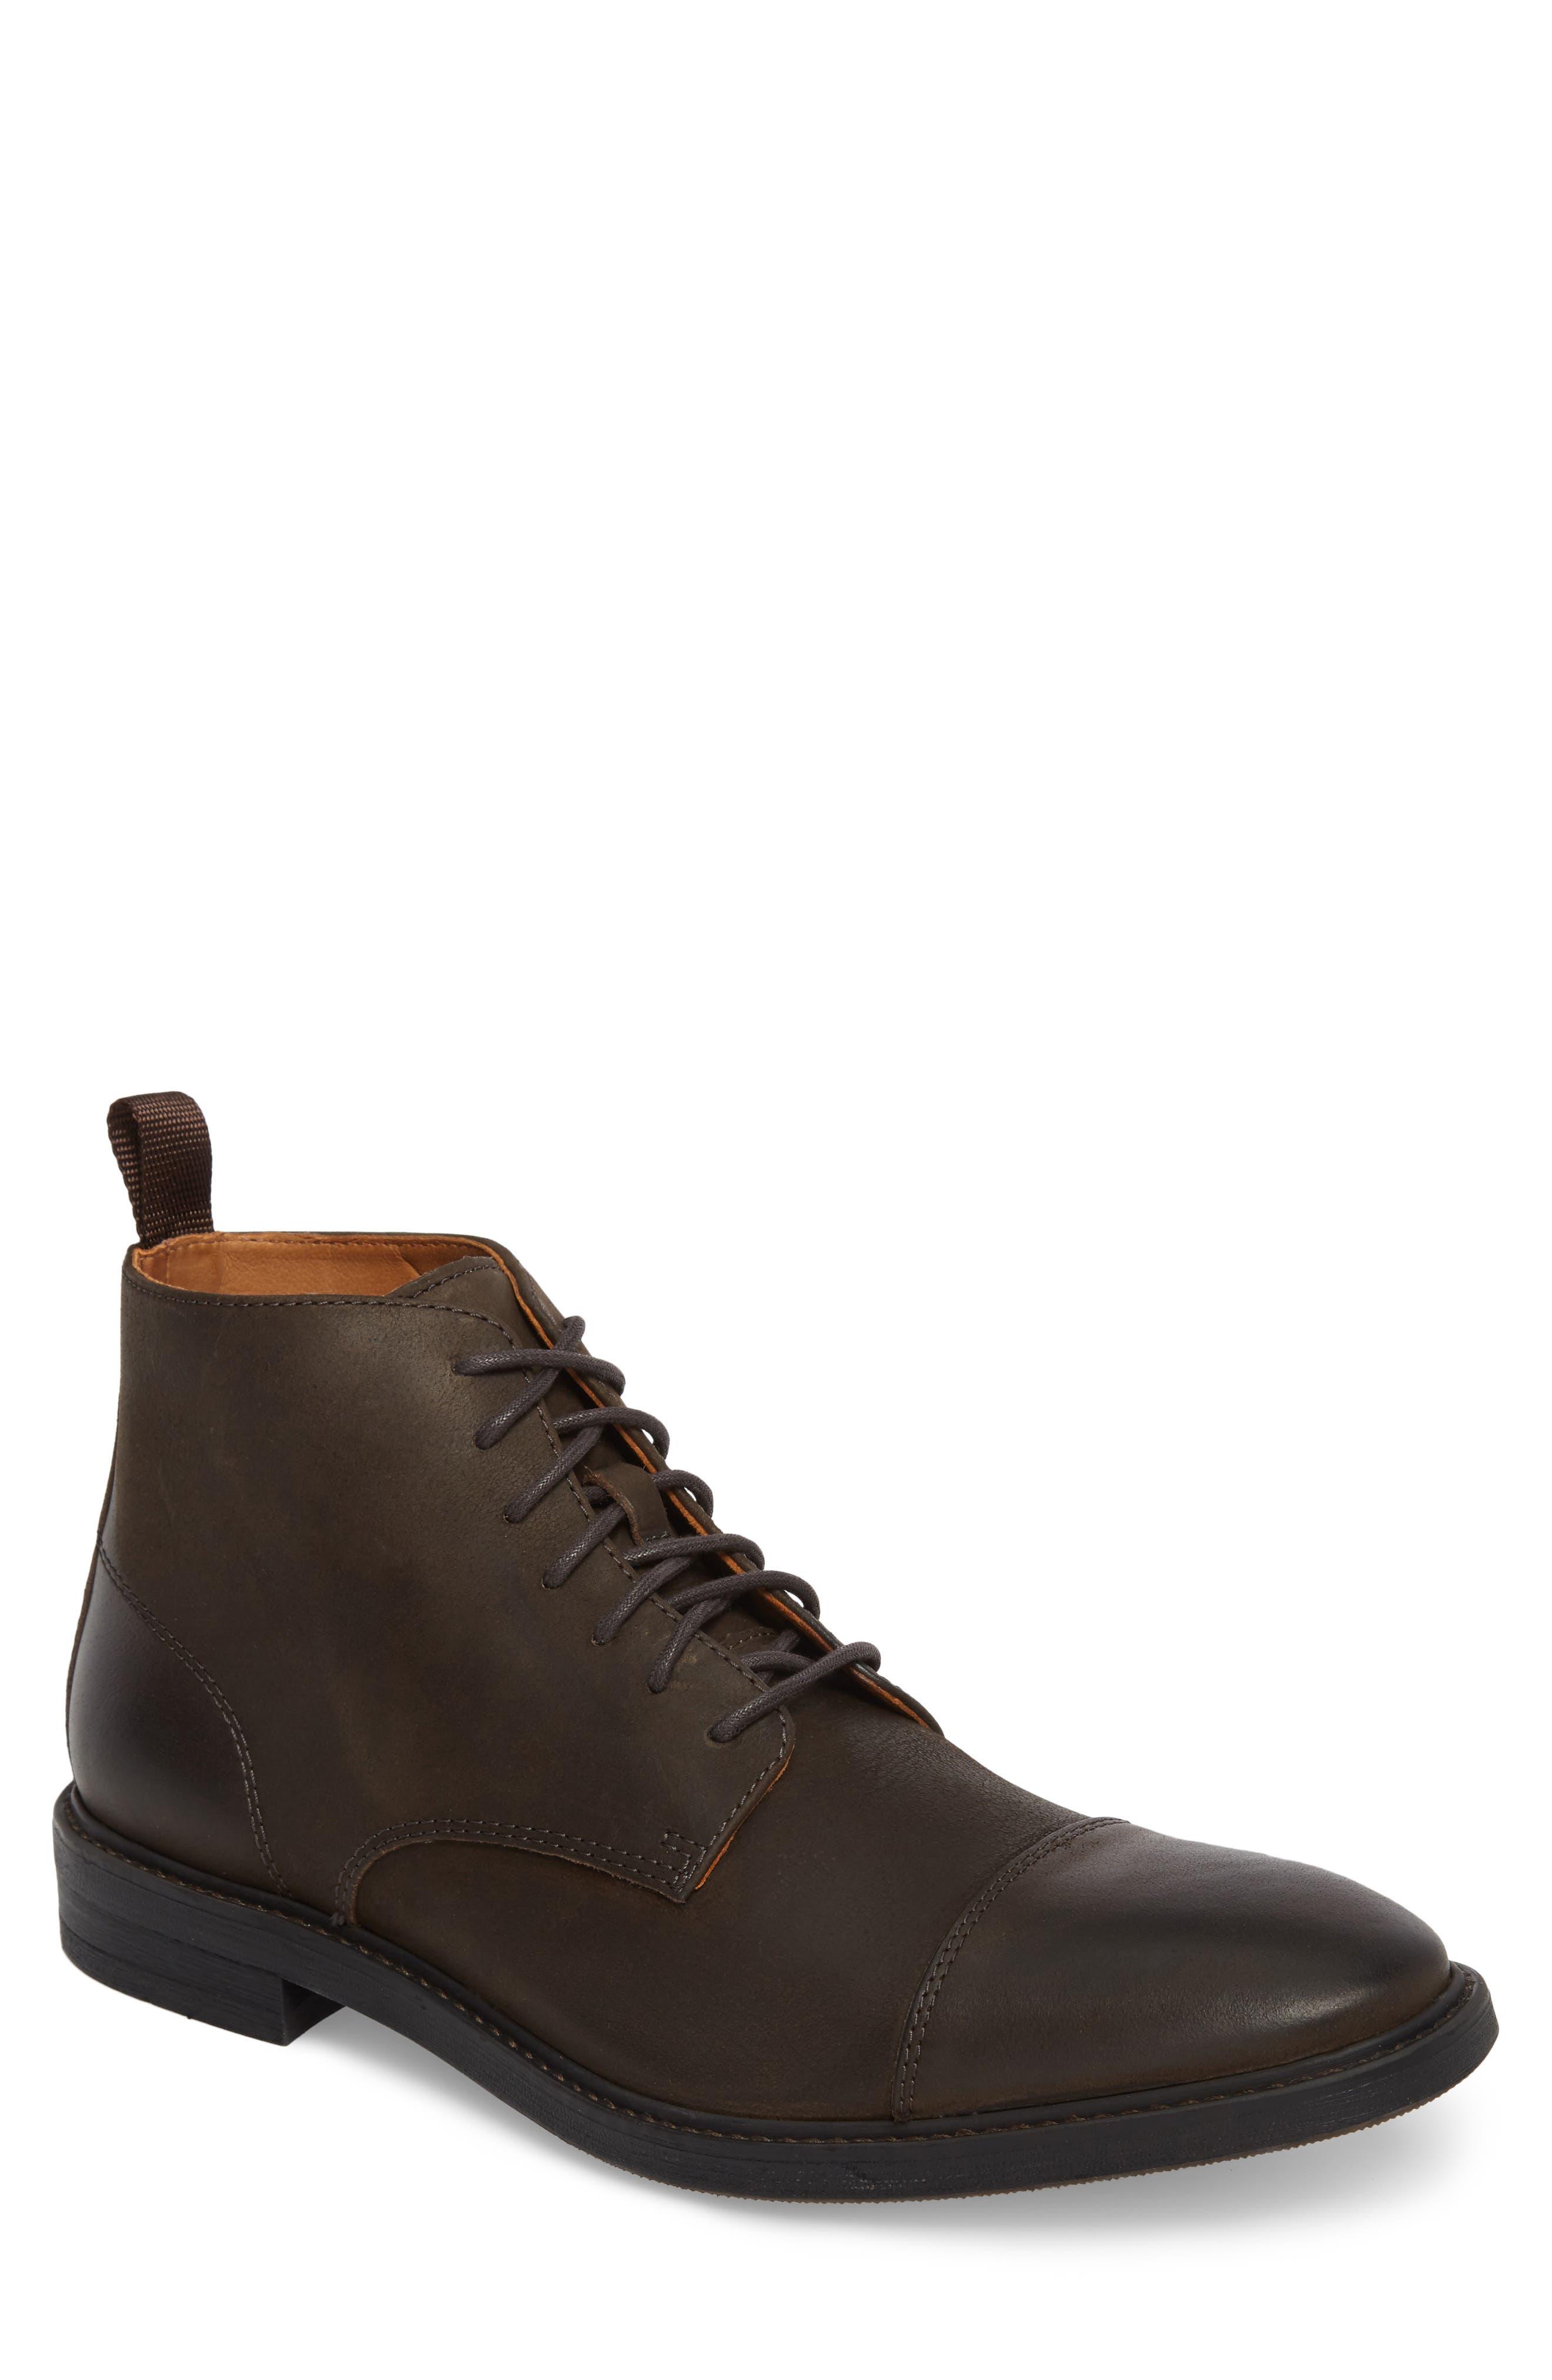 Pateros Cap Toe Boot,                         Main,                         color, Chocolate Leather